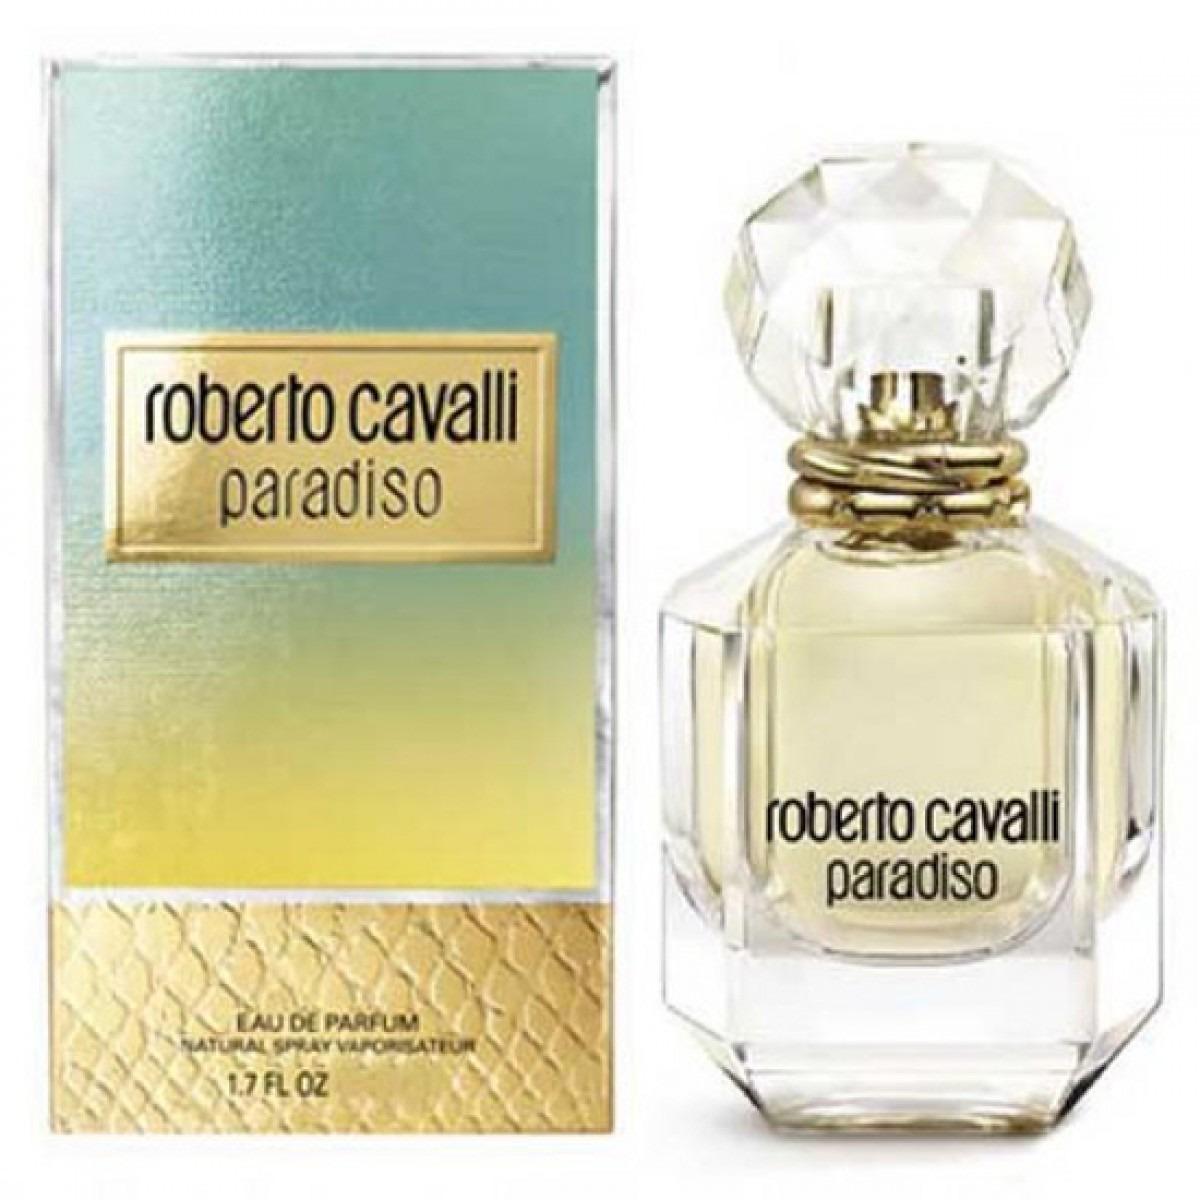 7b1338cc9e63a perfume roberto cavalli paradiso 75ml edp. Carregando zoom.